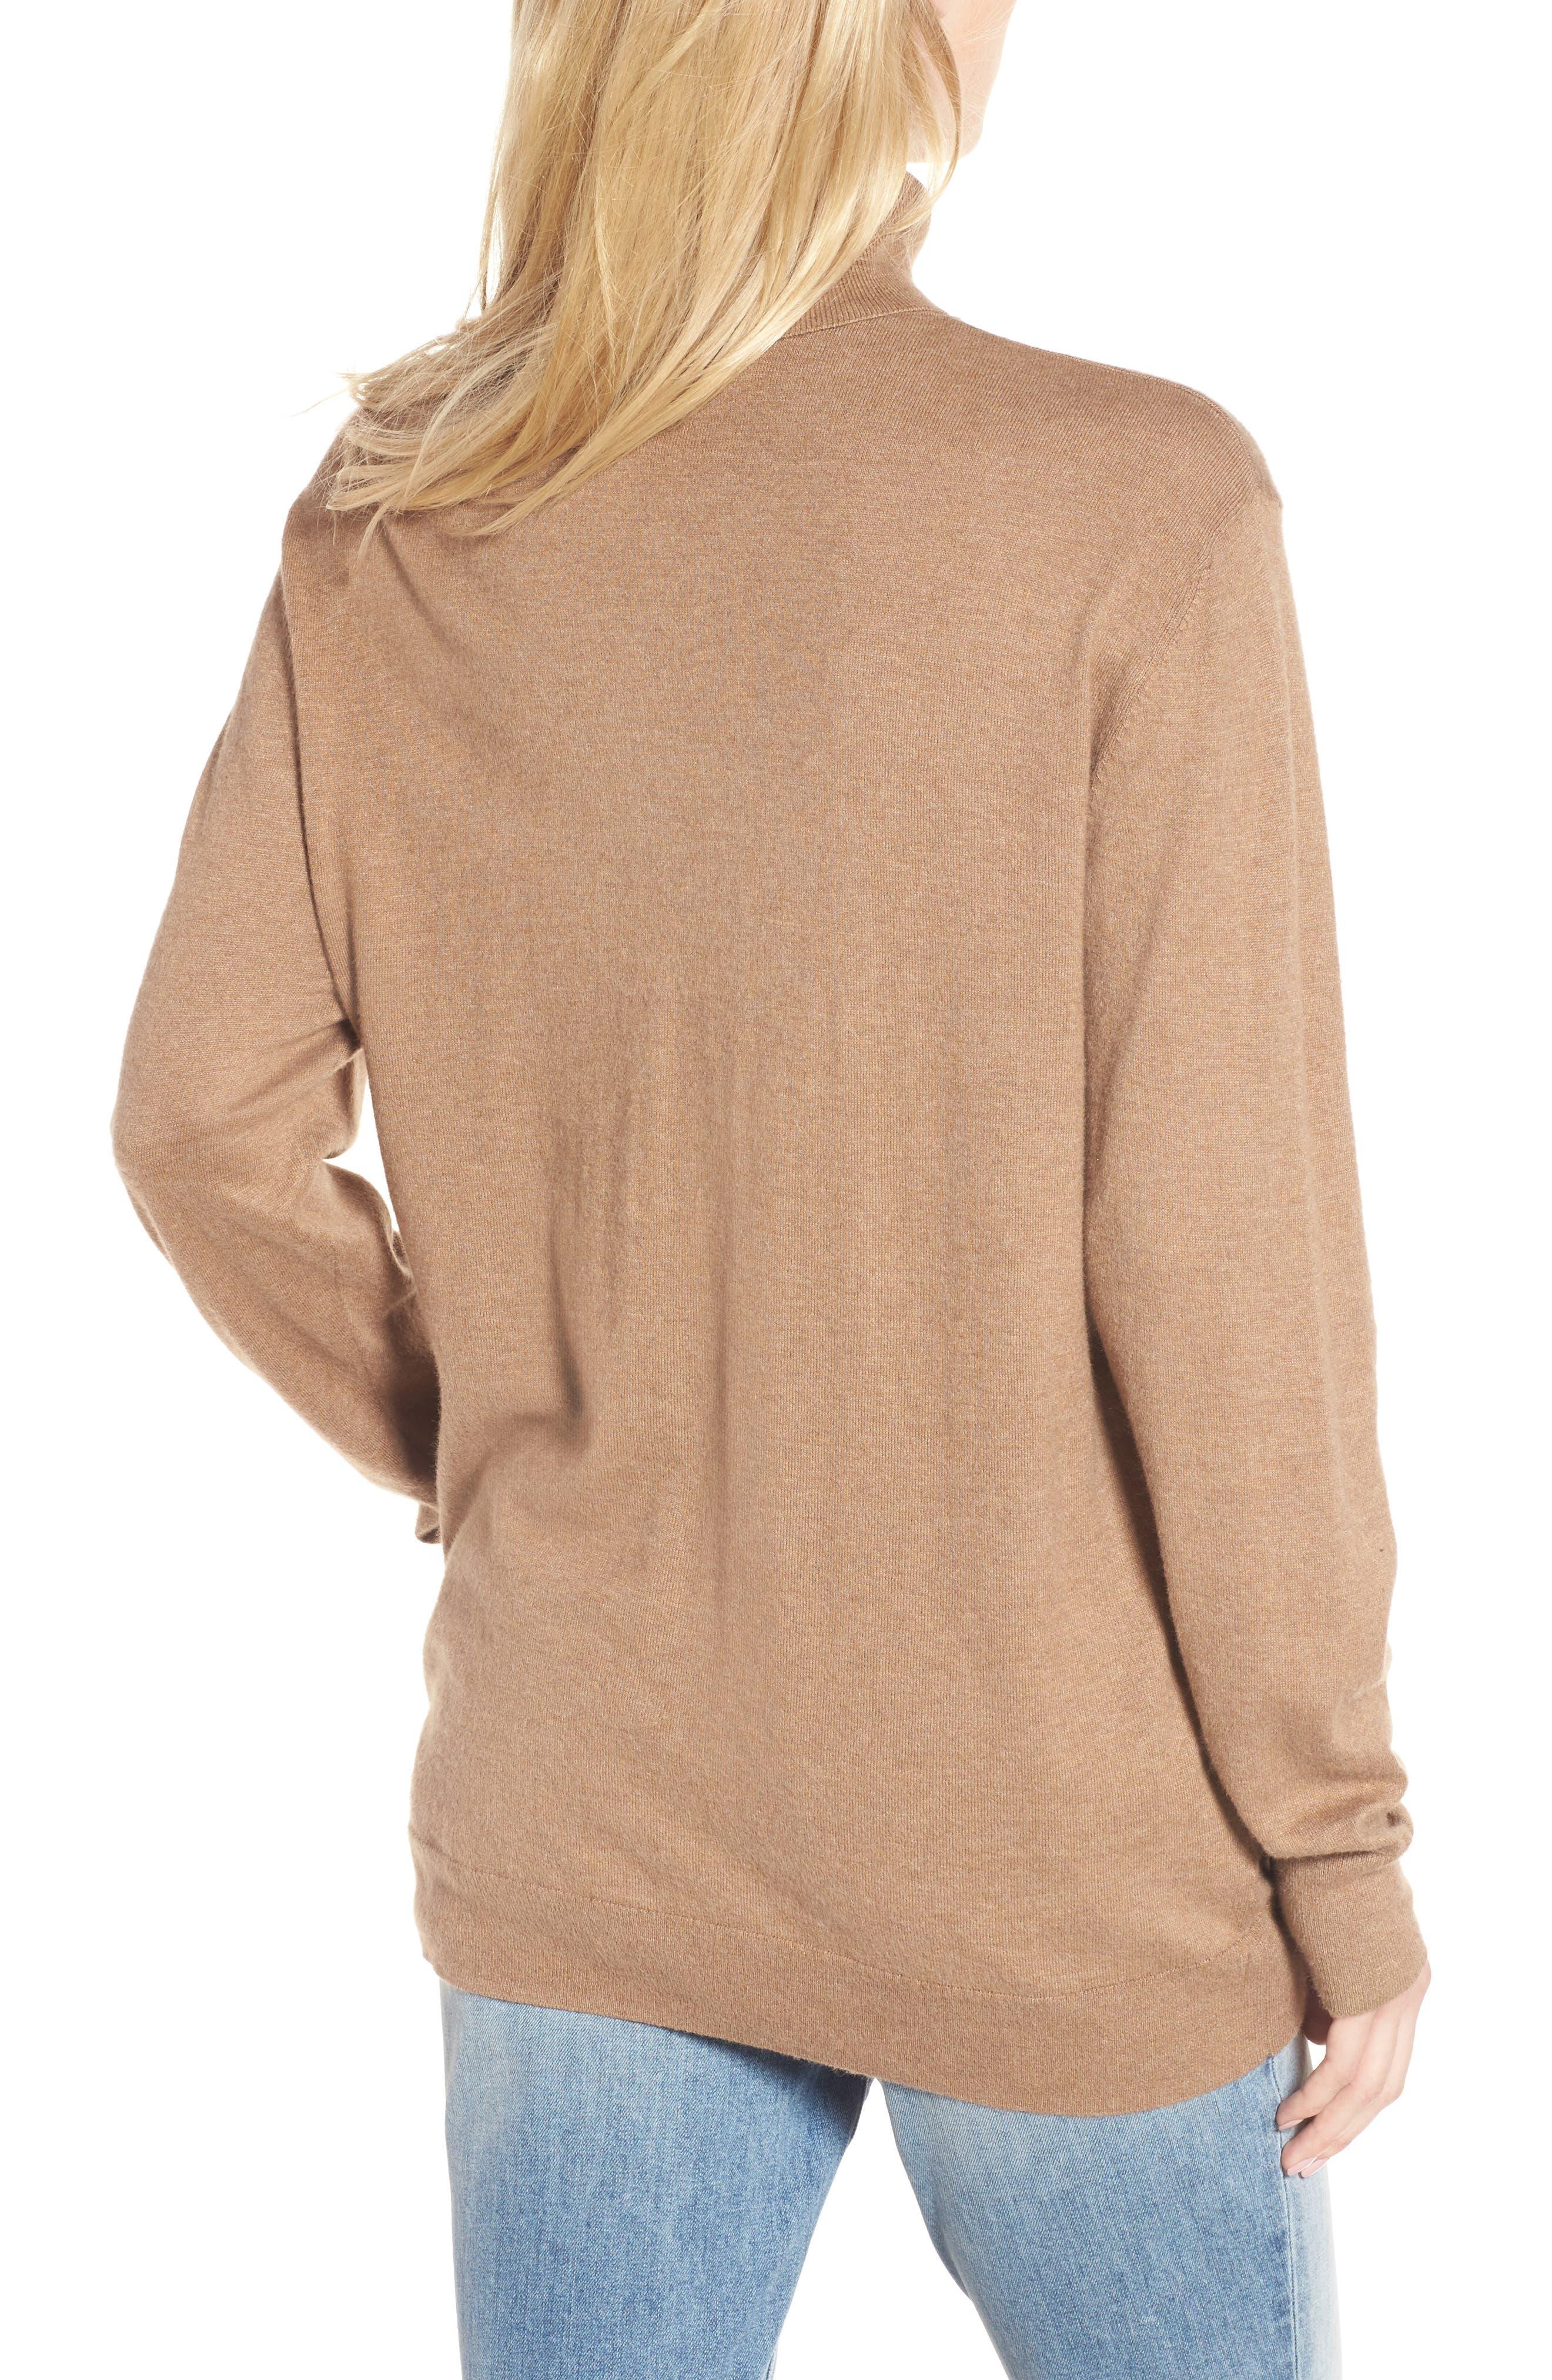 Boyfriend Turtleneck Sweater,                             Alternate thumbnail 6, color,